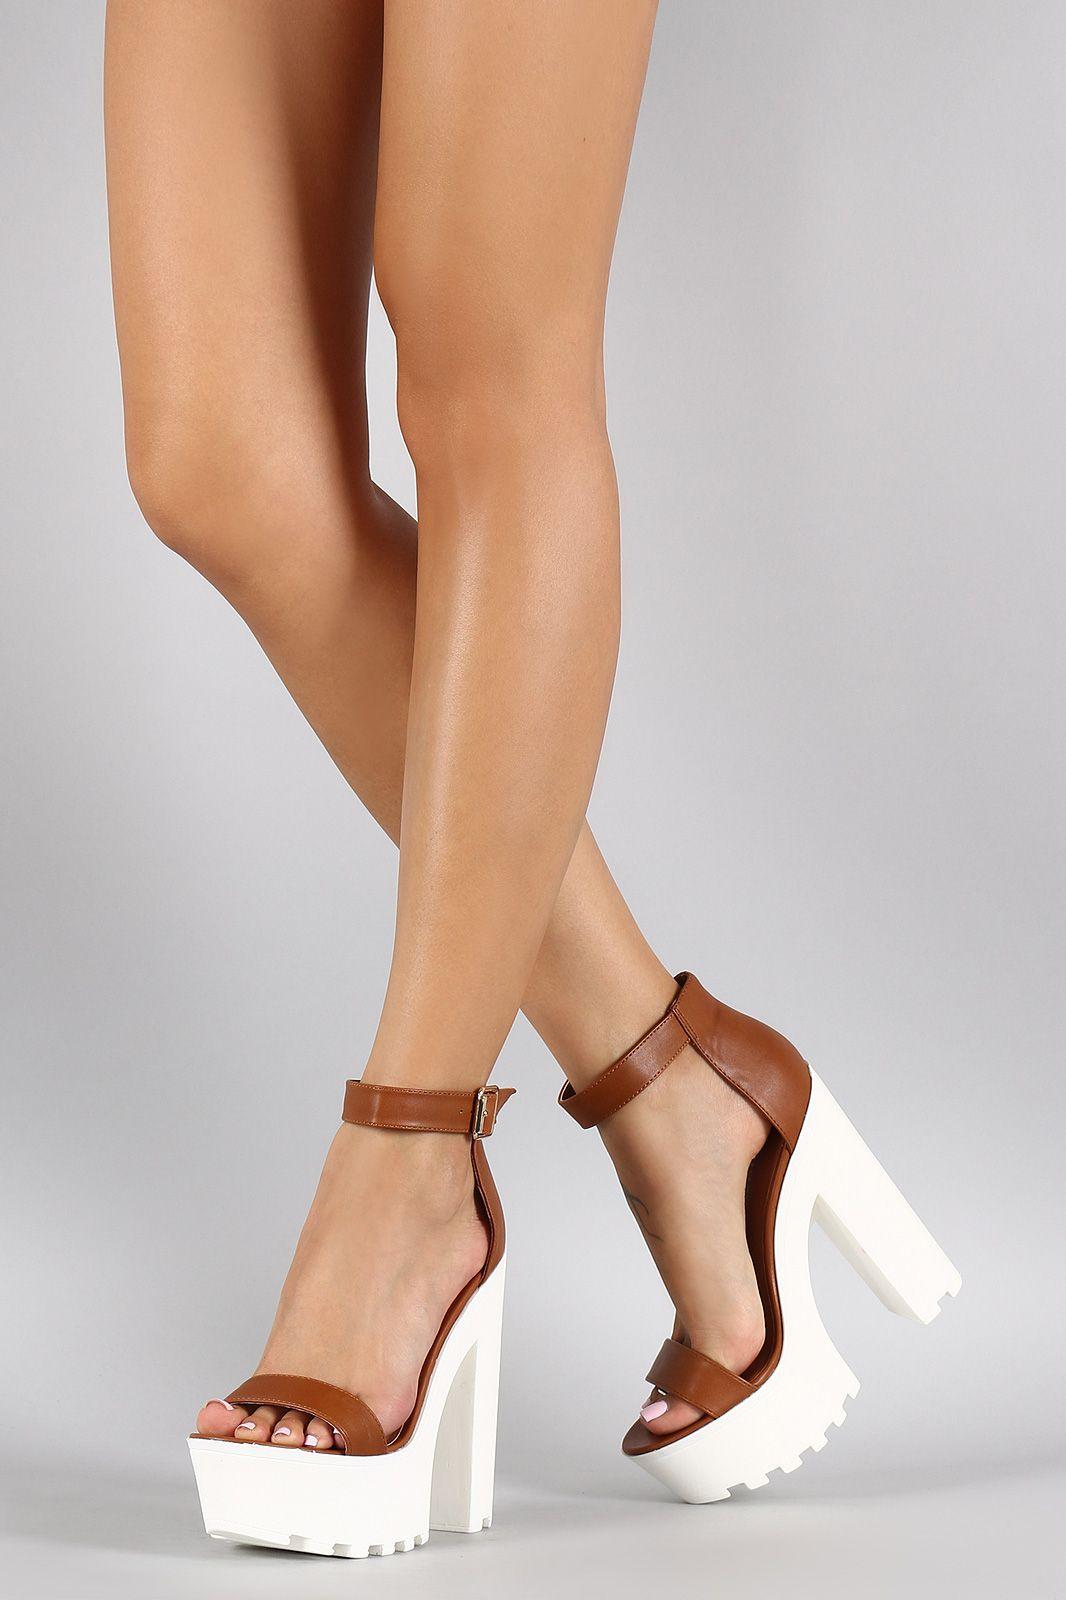 226e2c346e3 Wild Diva Lounge Two-Tone Leatherette Ankle Strap Lug Sole Platform Heel